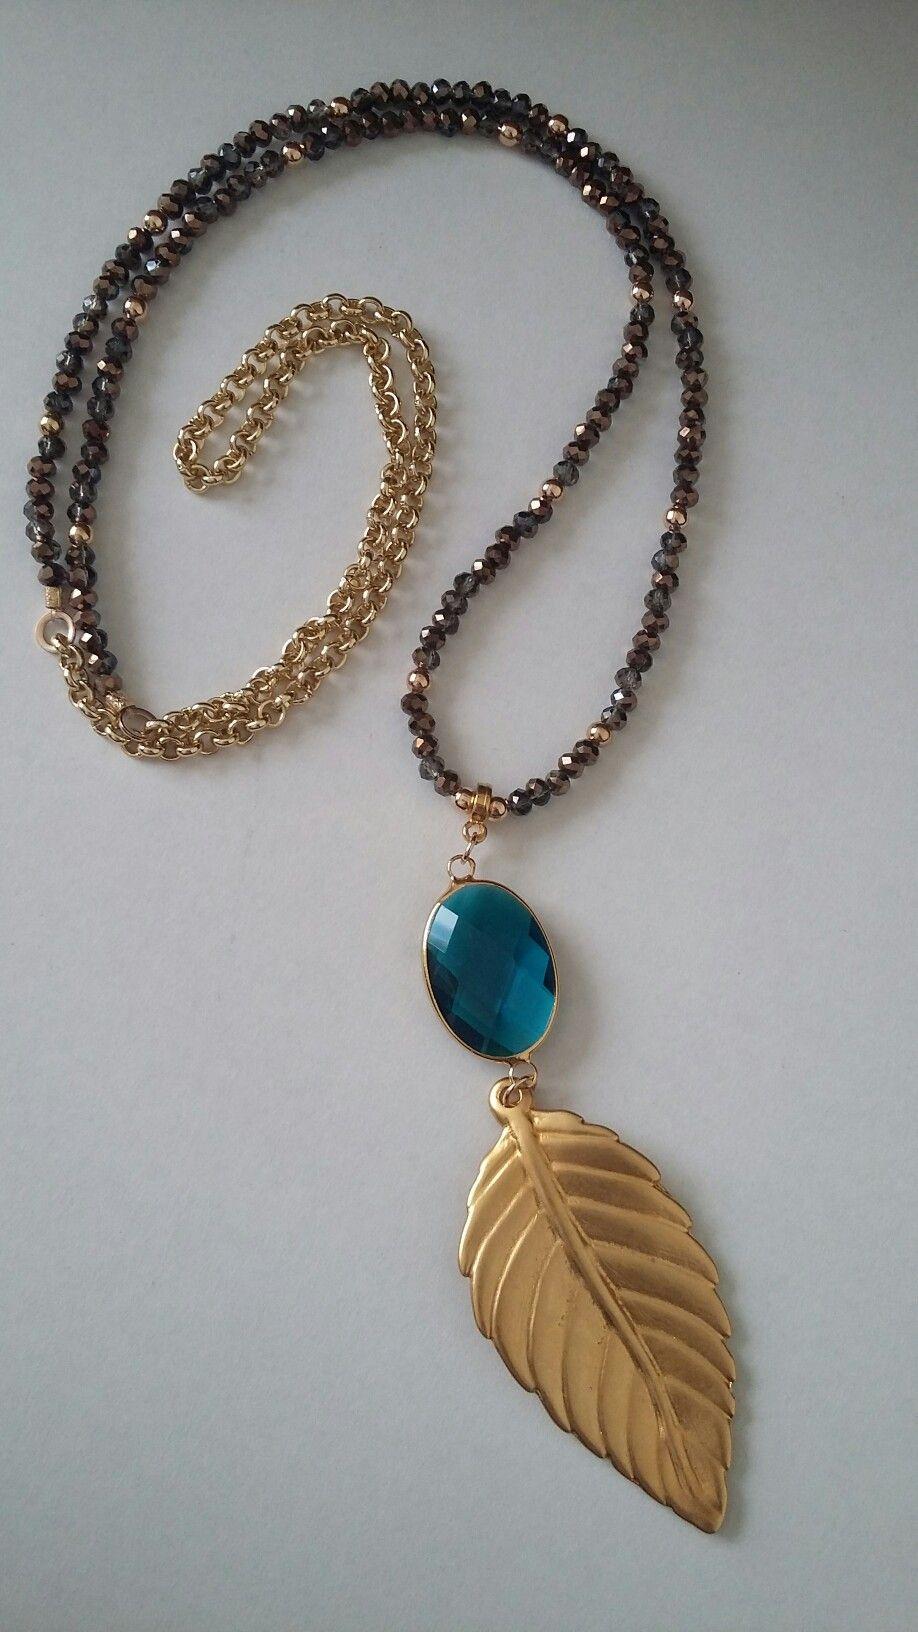 f7dbfba44968 Collar largo de Creaciones Little Flower. Bisutería fina 100% artesanal.